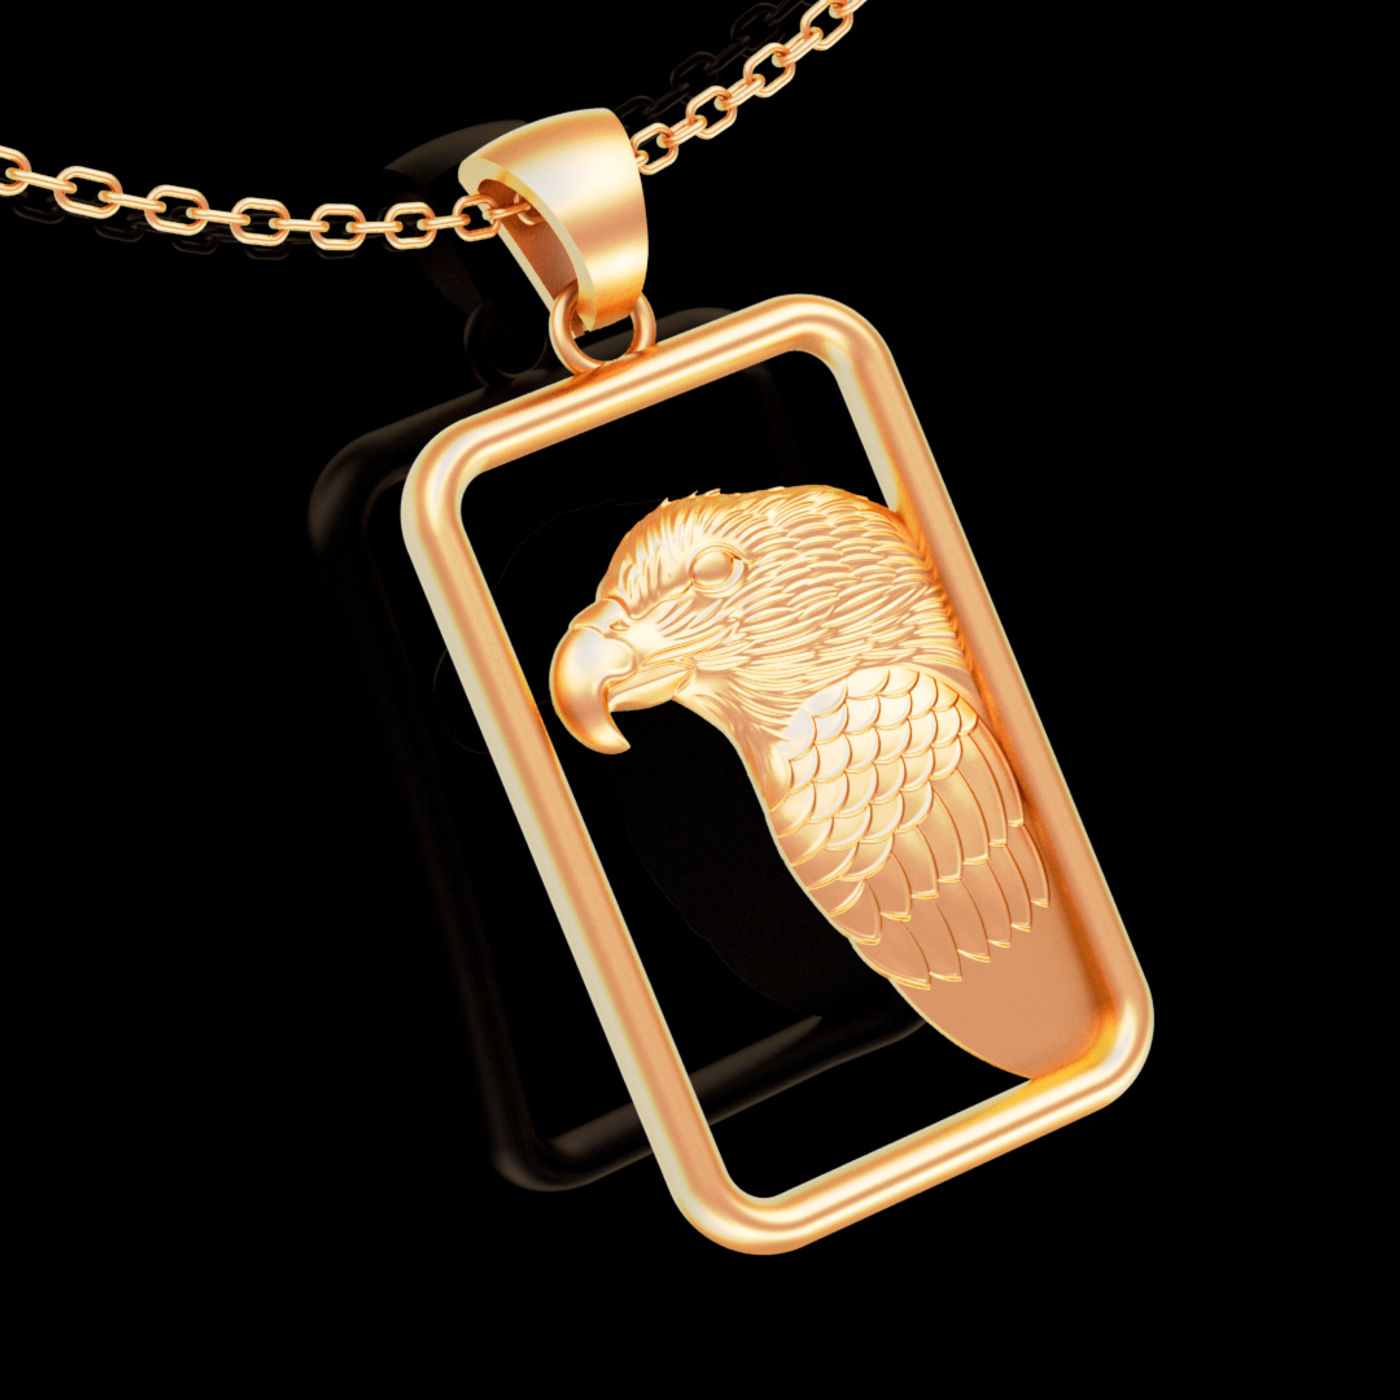 Eagle Head Figure pendant jewelry gold necklace medallion 3D print model